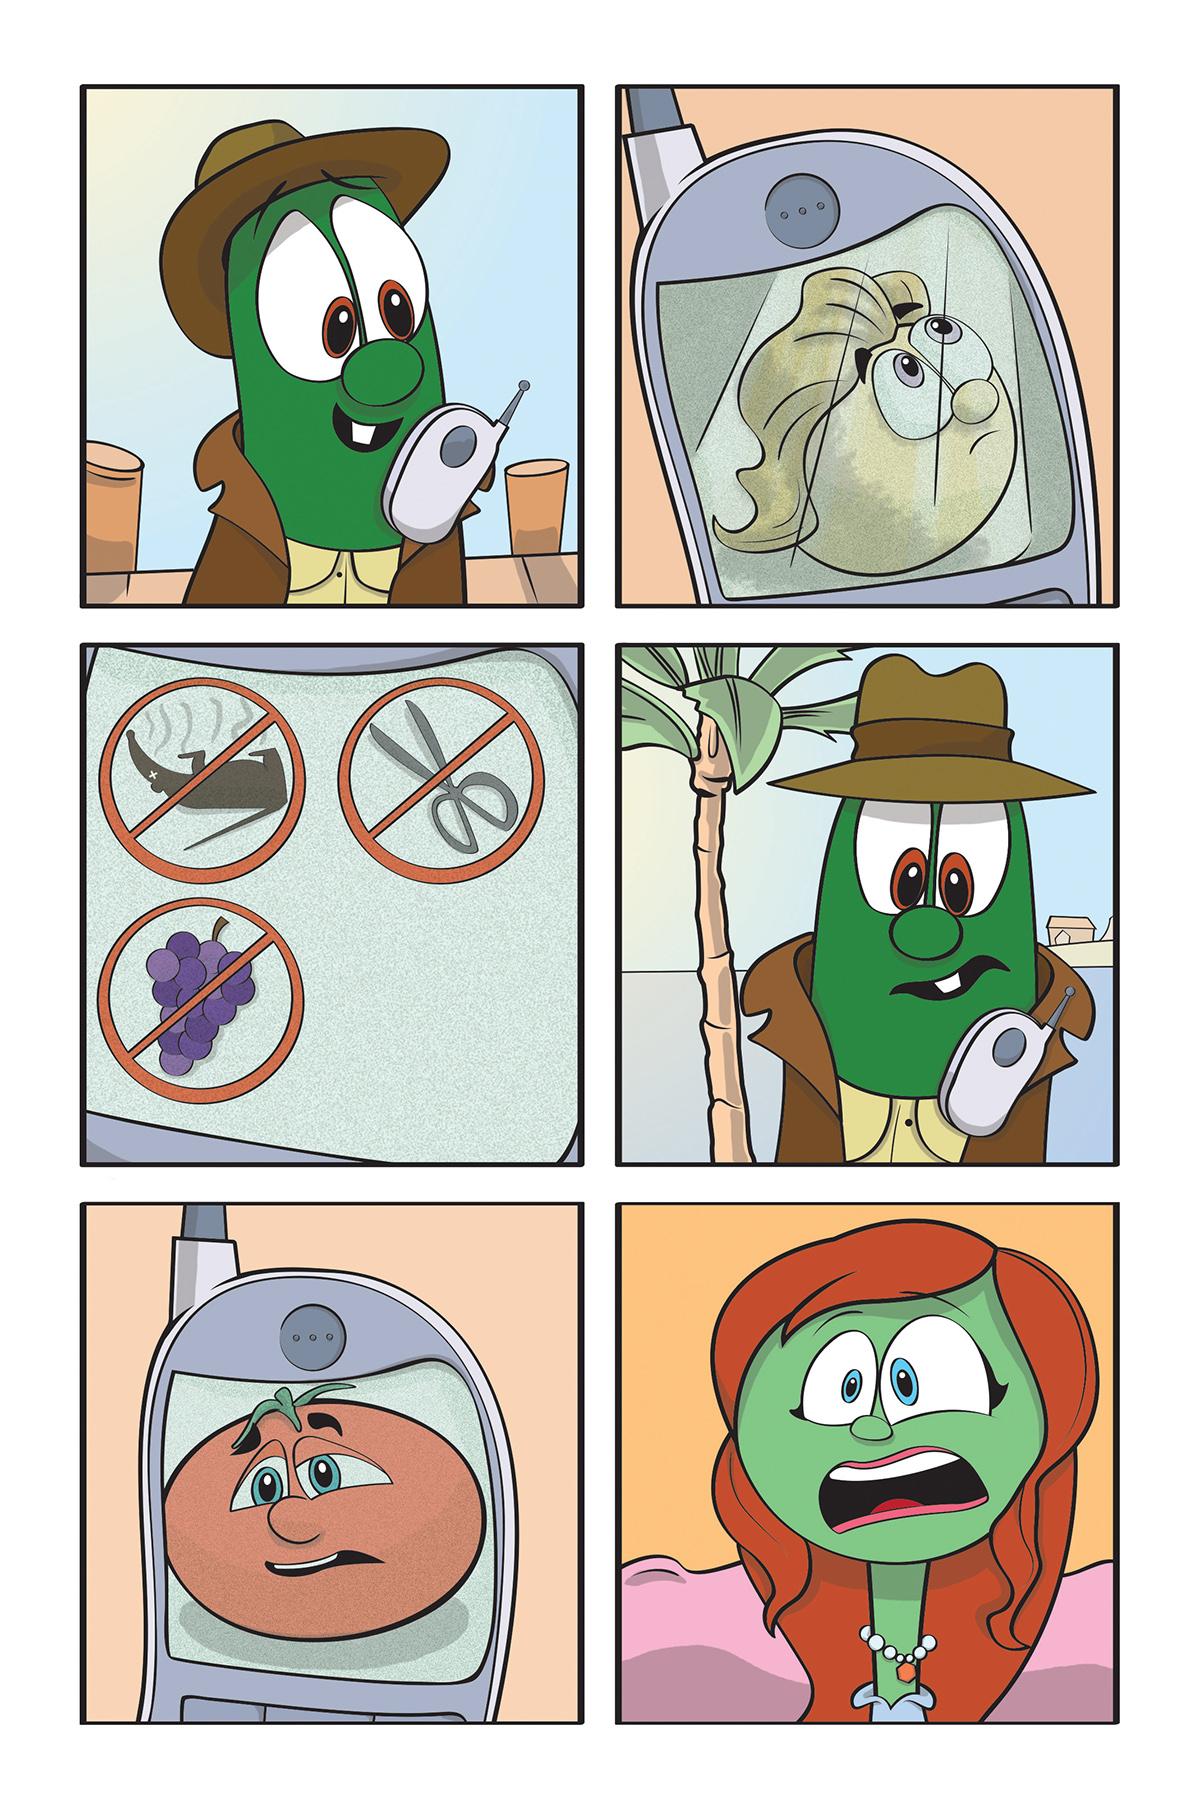 veggietales minnesota cuke coloring pages - photo#22